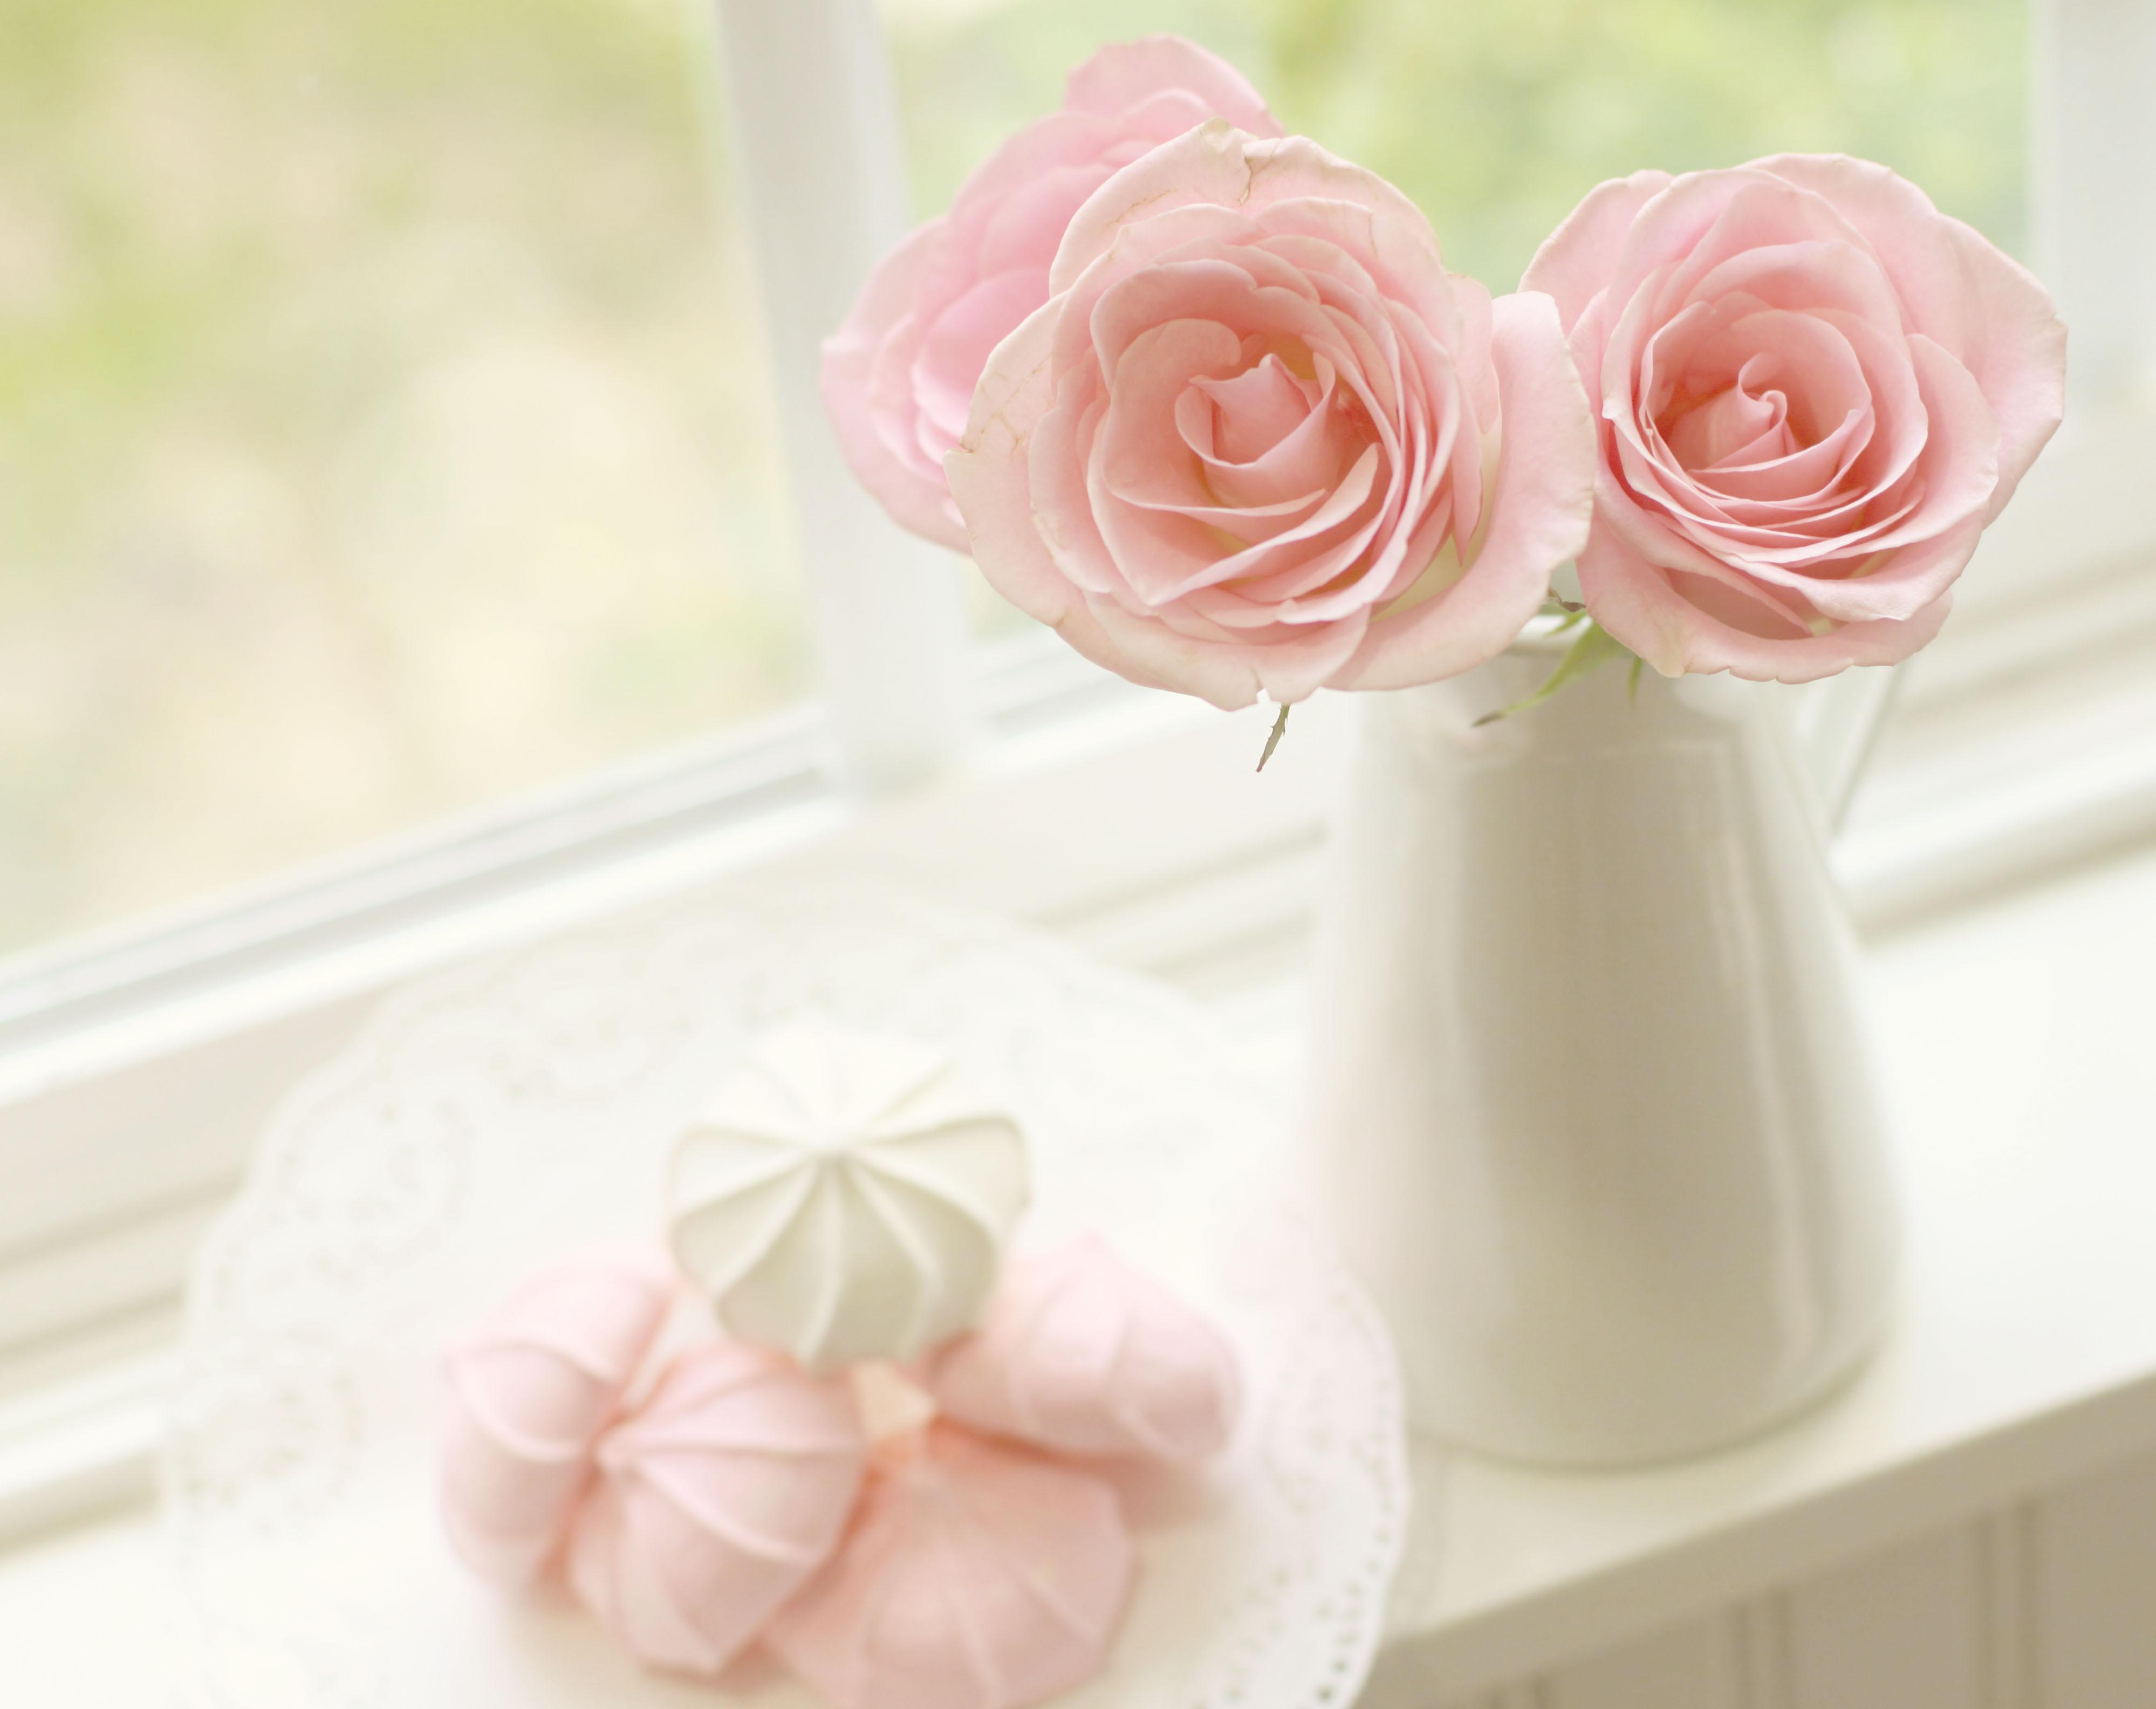 Wallpaper White Window Whipped Cream Peach Cream Pastel Pink